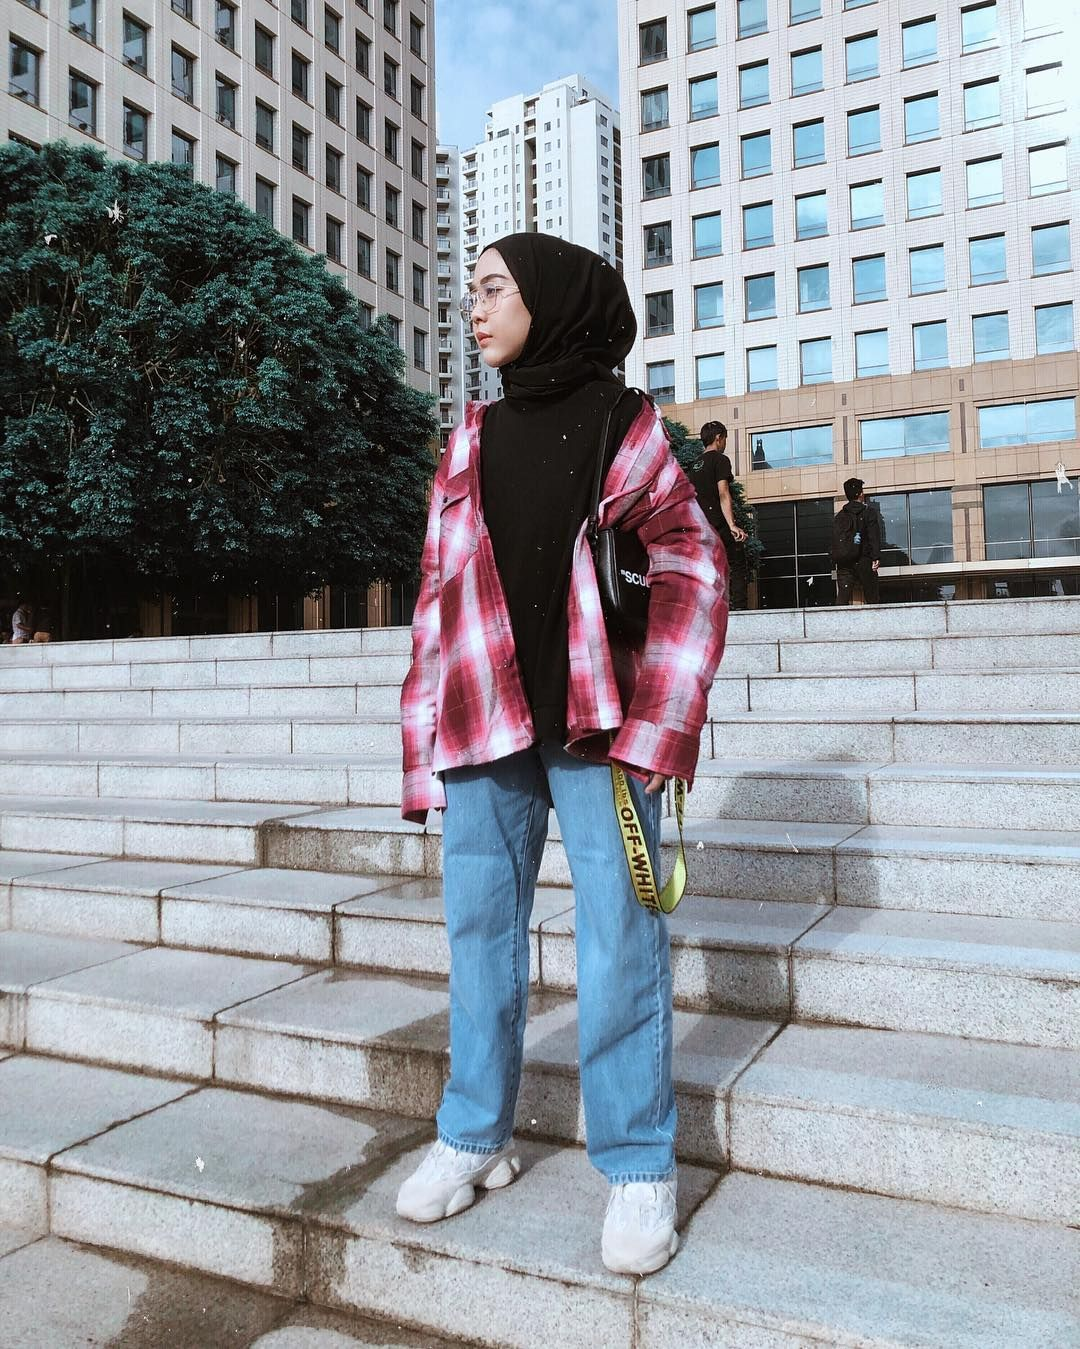 Ootd Pake Boyfriend Jeans Nya Klambigue Sukaa Bgt Boyfriend Jeans Hijab Fashion Inspiration Hijabi Fashion